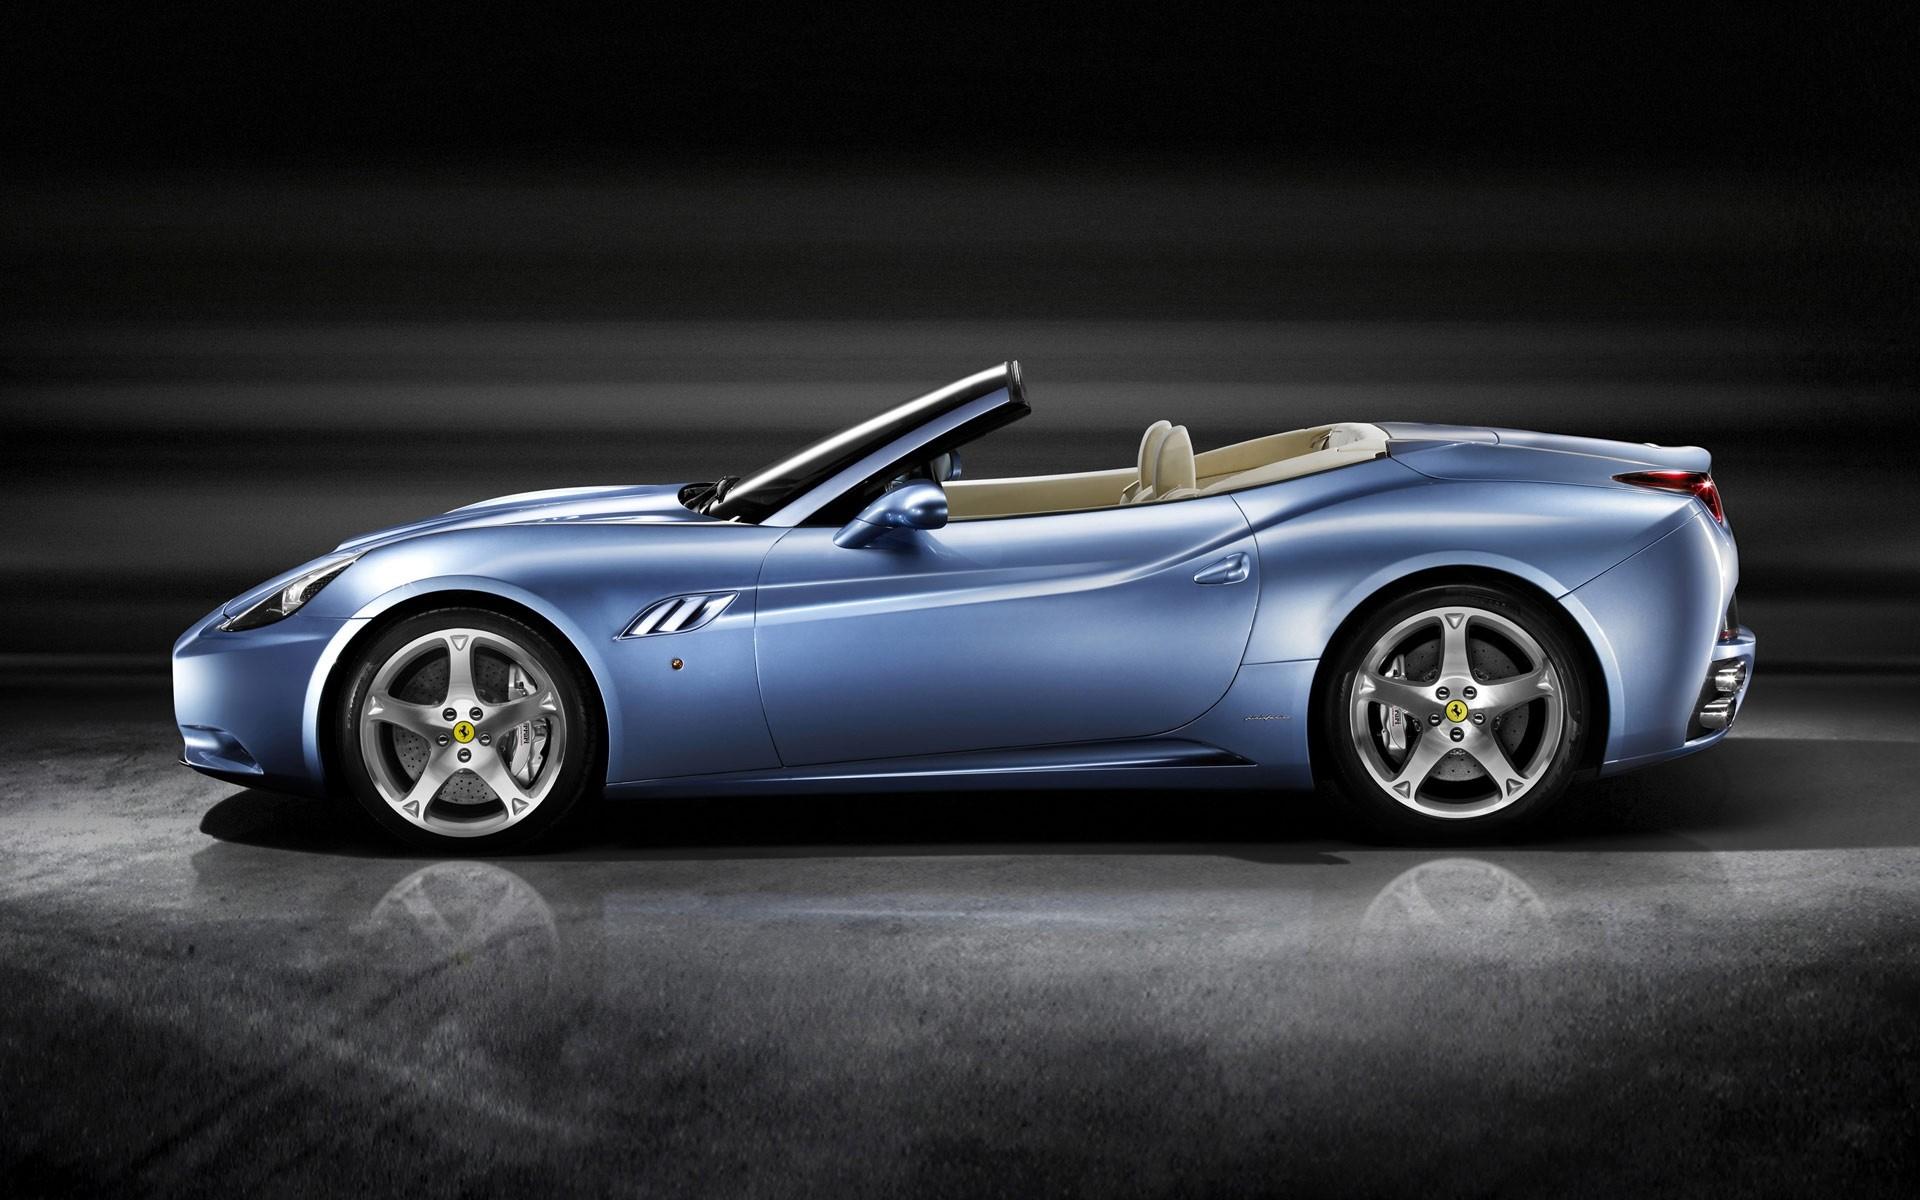 Ferrari California Blue Iphone Wallpapers For Free